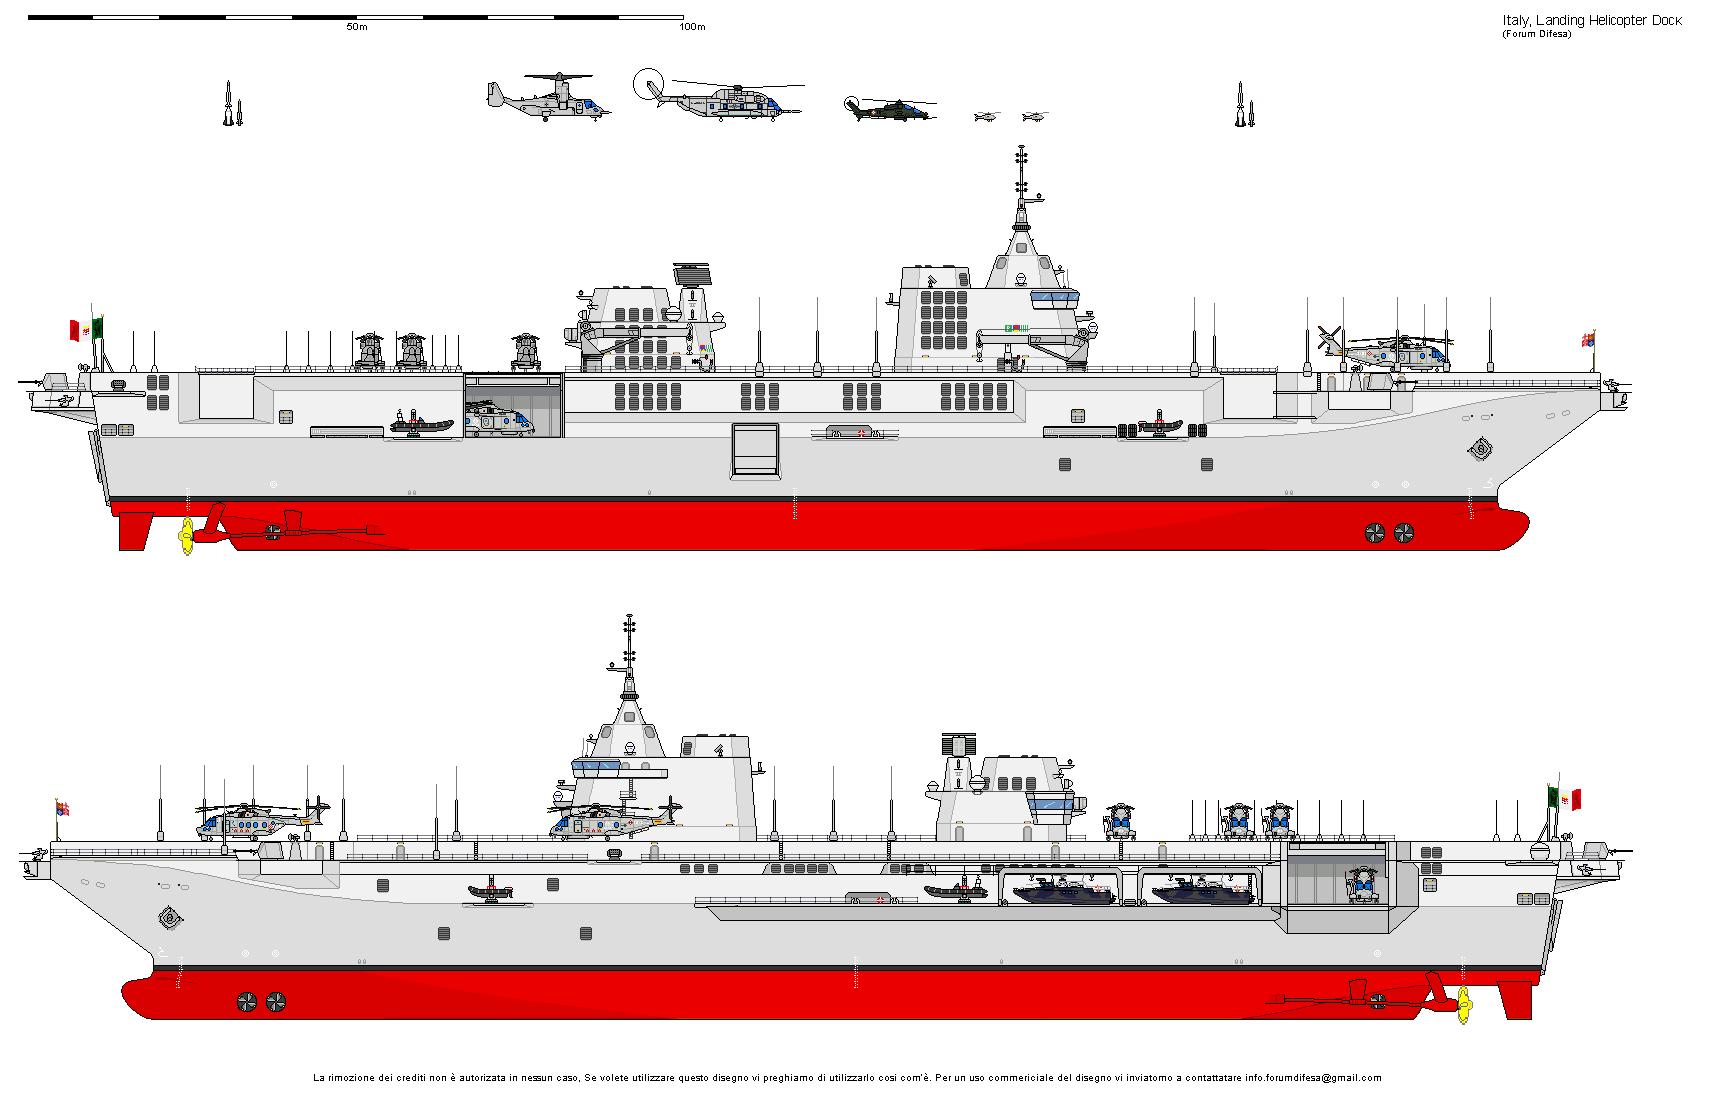 "LHD/LHA classe ""Trieste"" Portaerei, Nave"